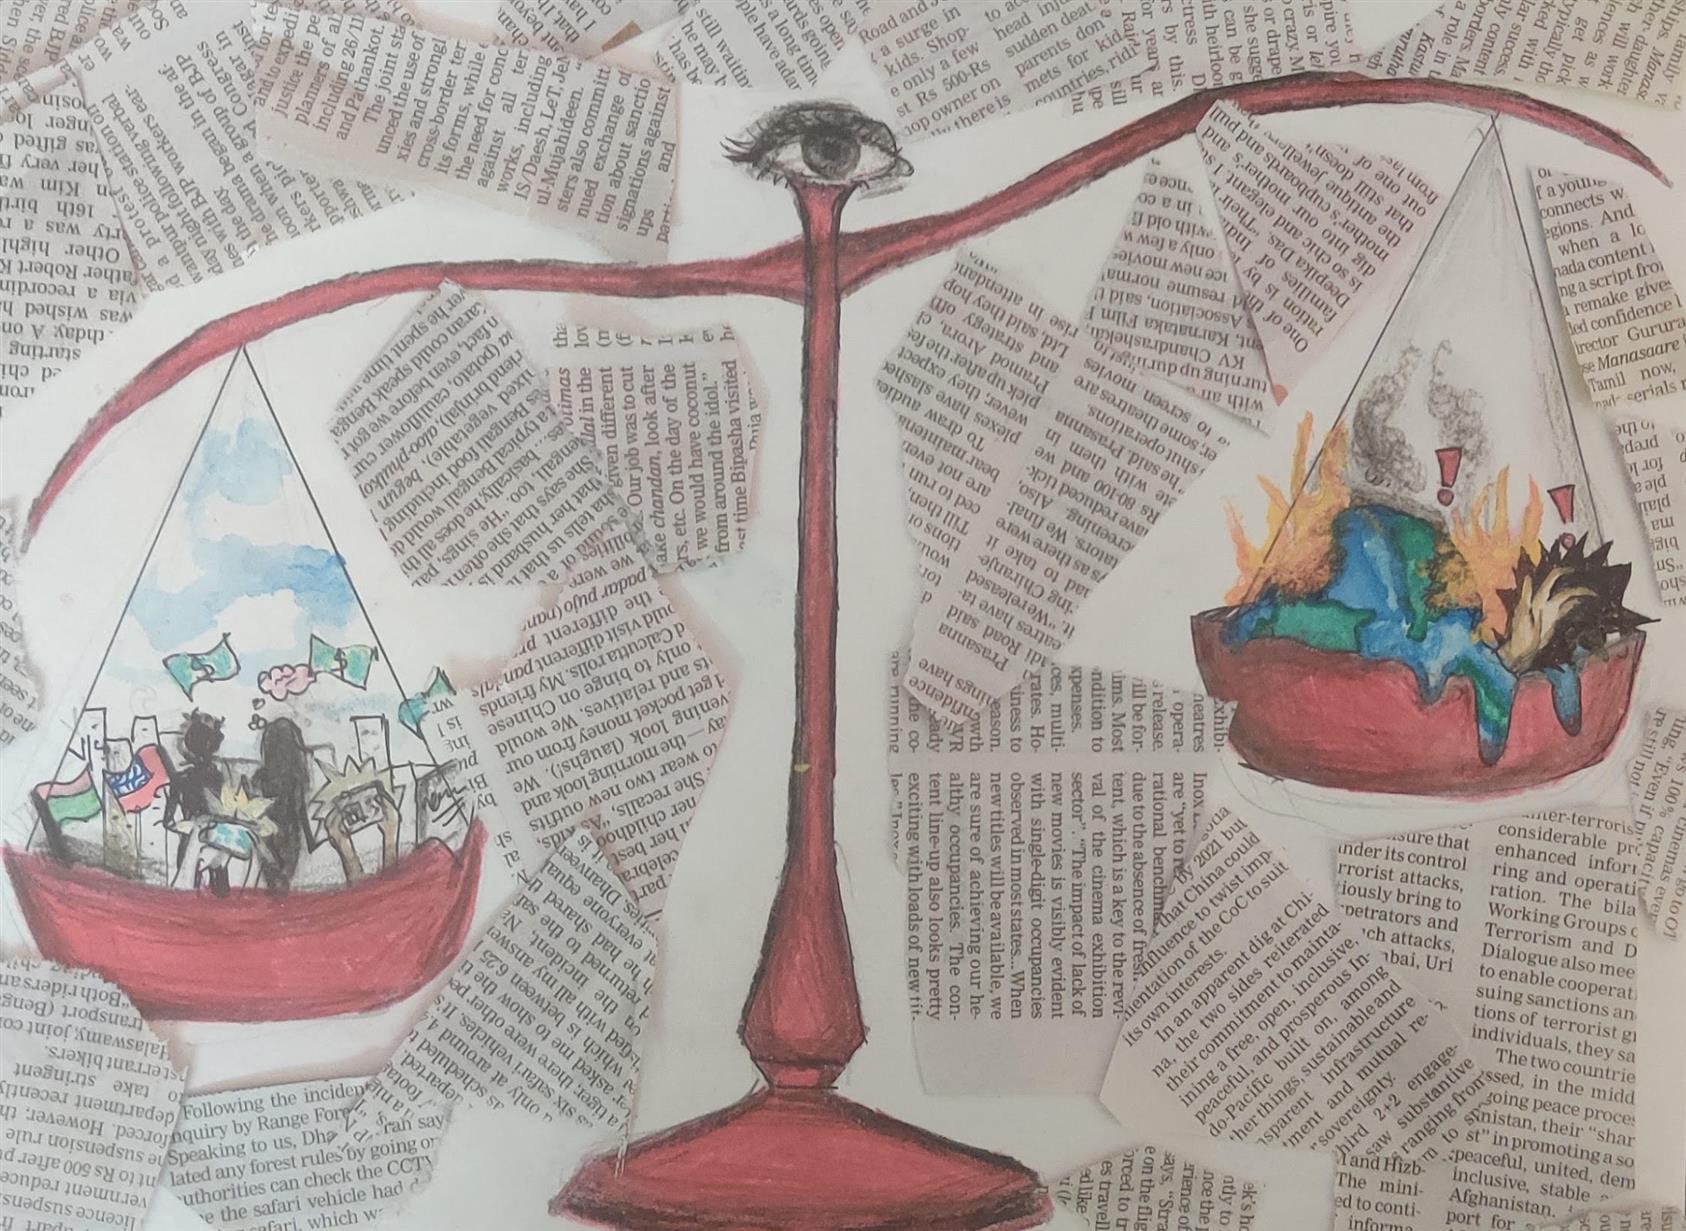 NEGLECTED ENVIRONMENT: Akhila Rahul